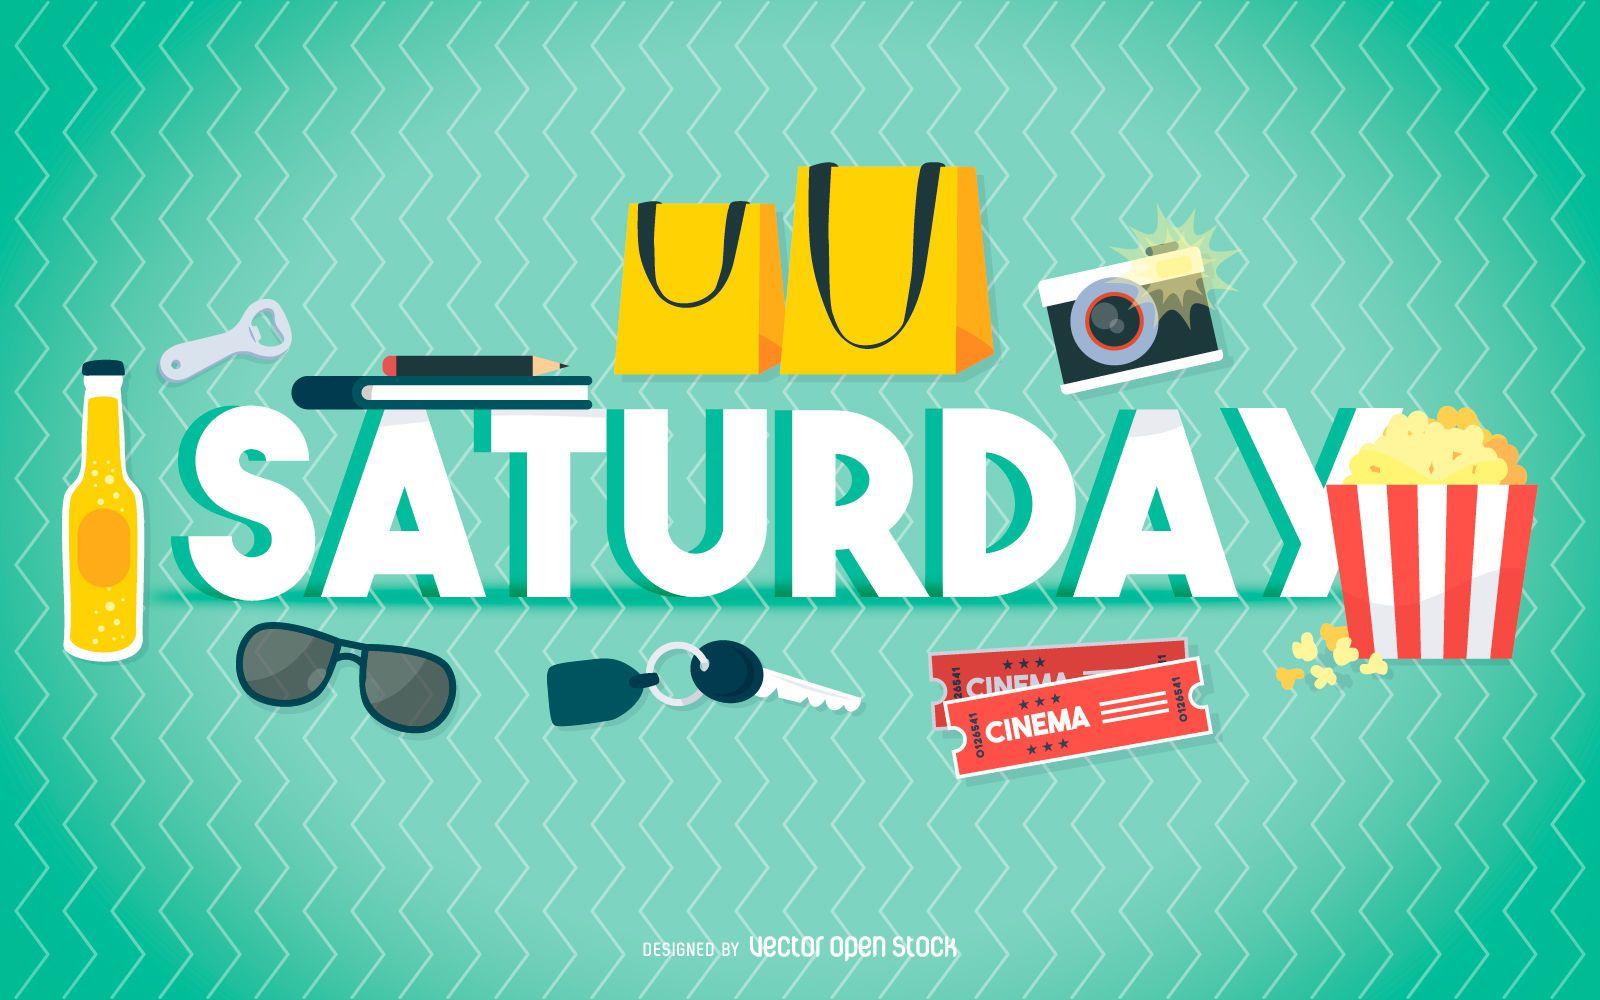 Saturday entertainment poster